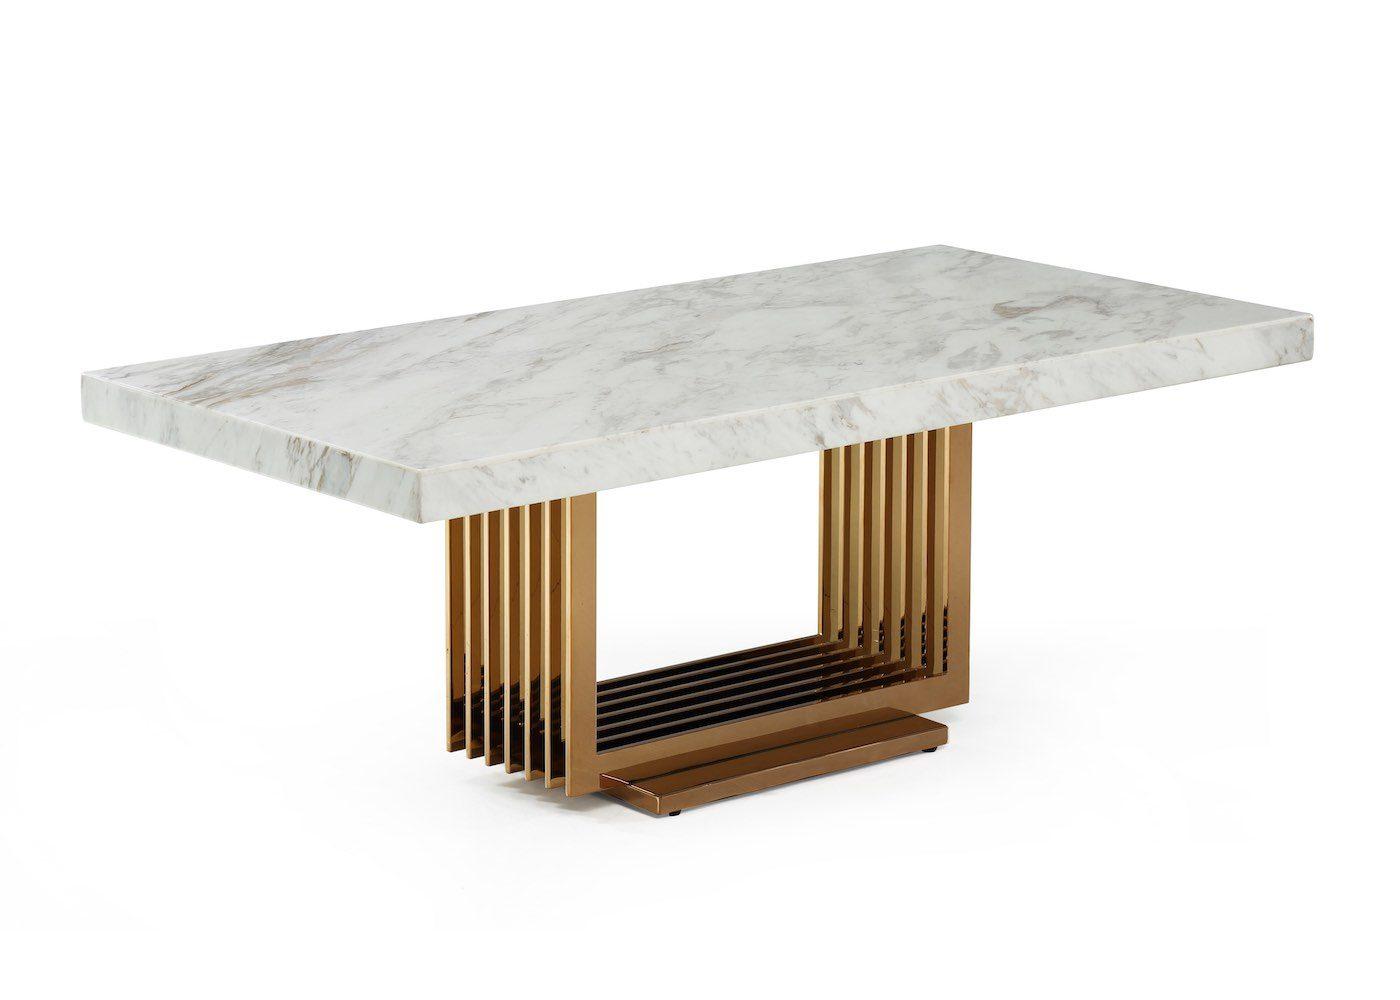 mazarin-ameublement-catalogue-produits-table-basse-1